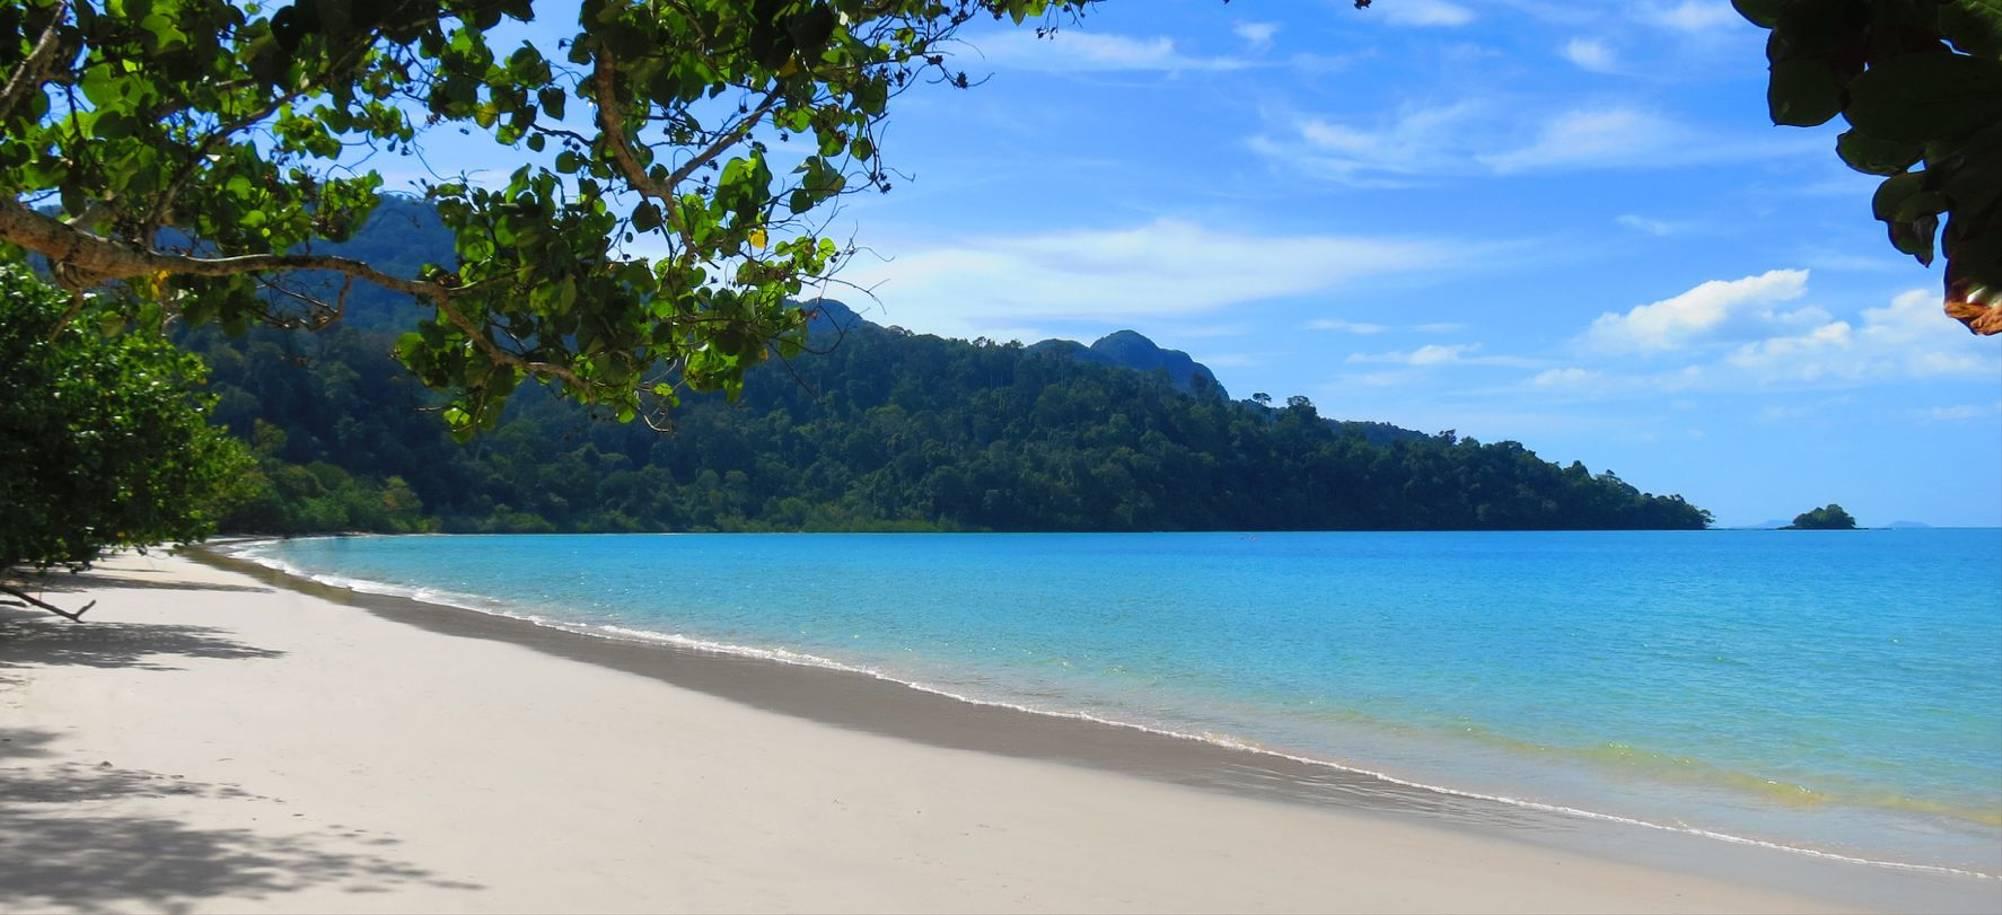 Langkawi   Beautiful White Sand Beaches   Itinerary Desktop